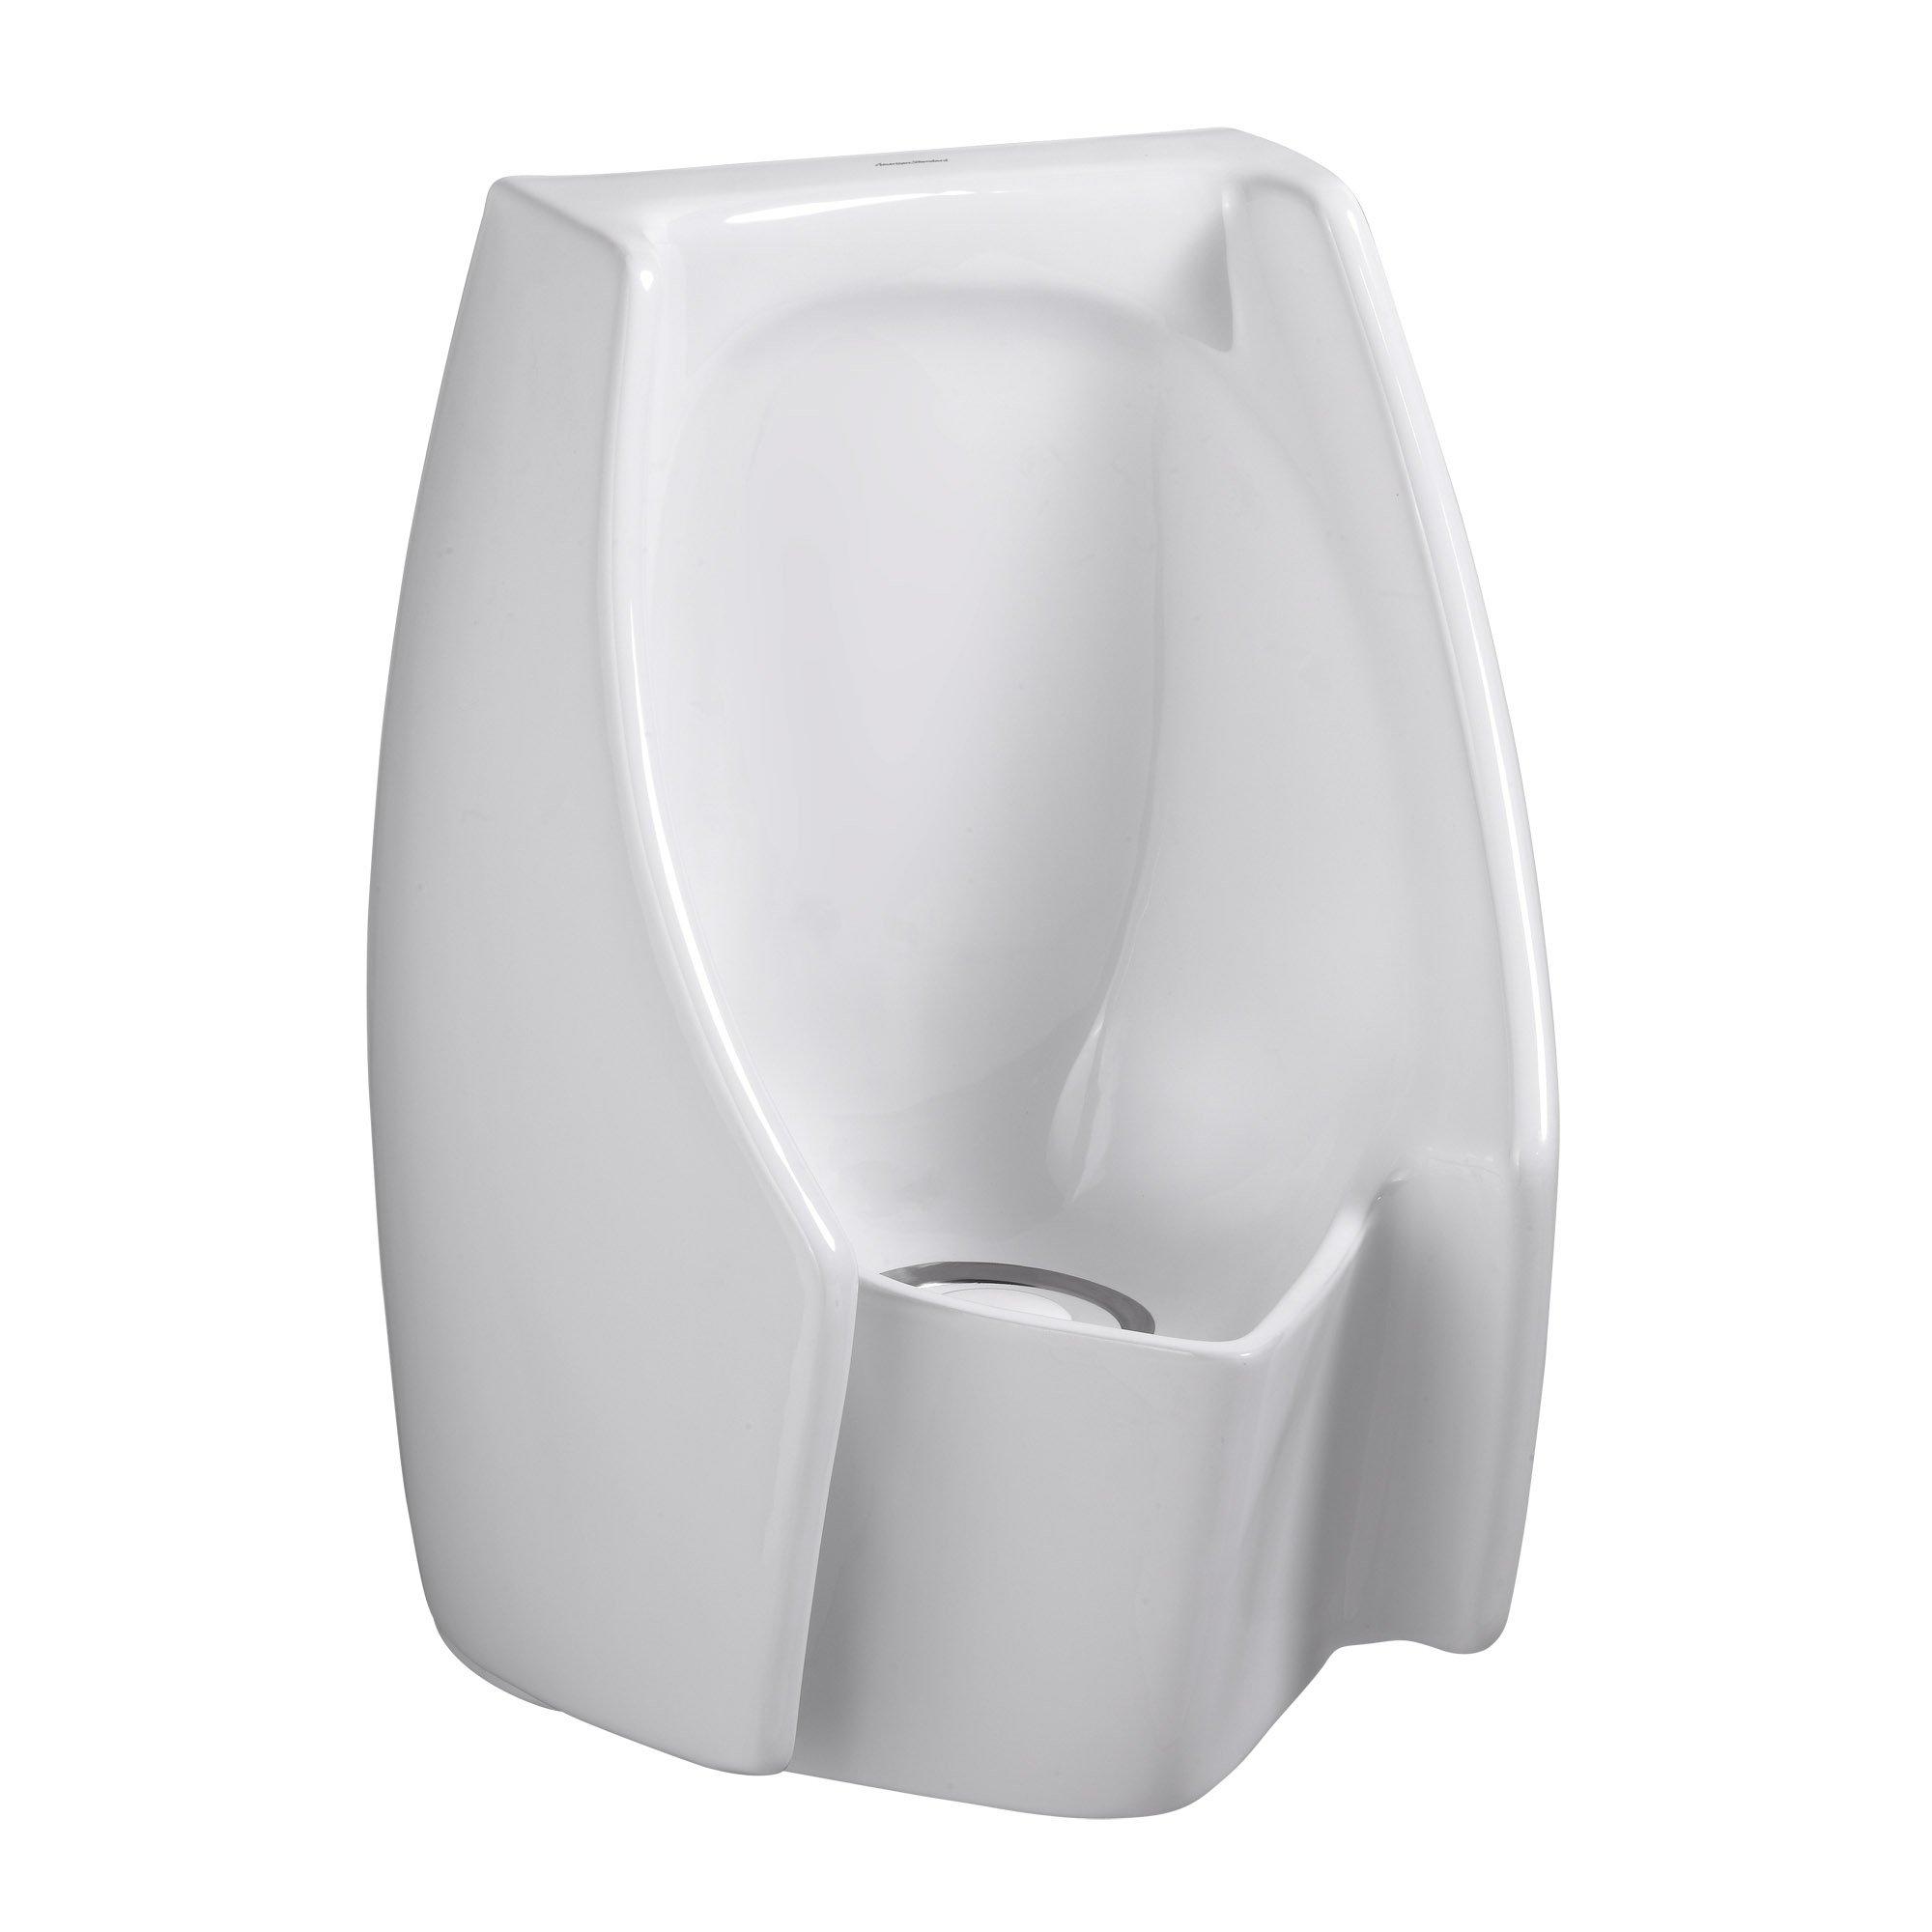 American Standard 6150100.020 Flowise Flush Free Waterless Urinal